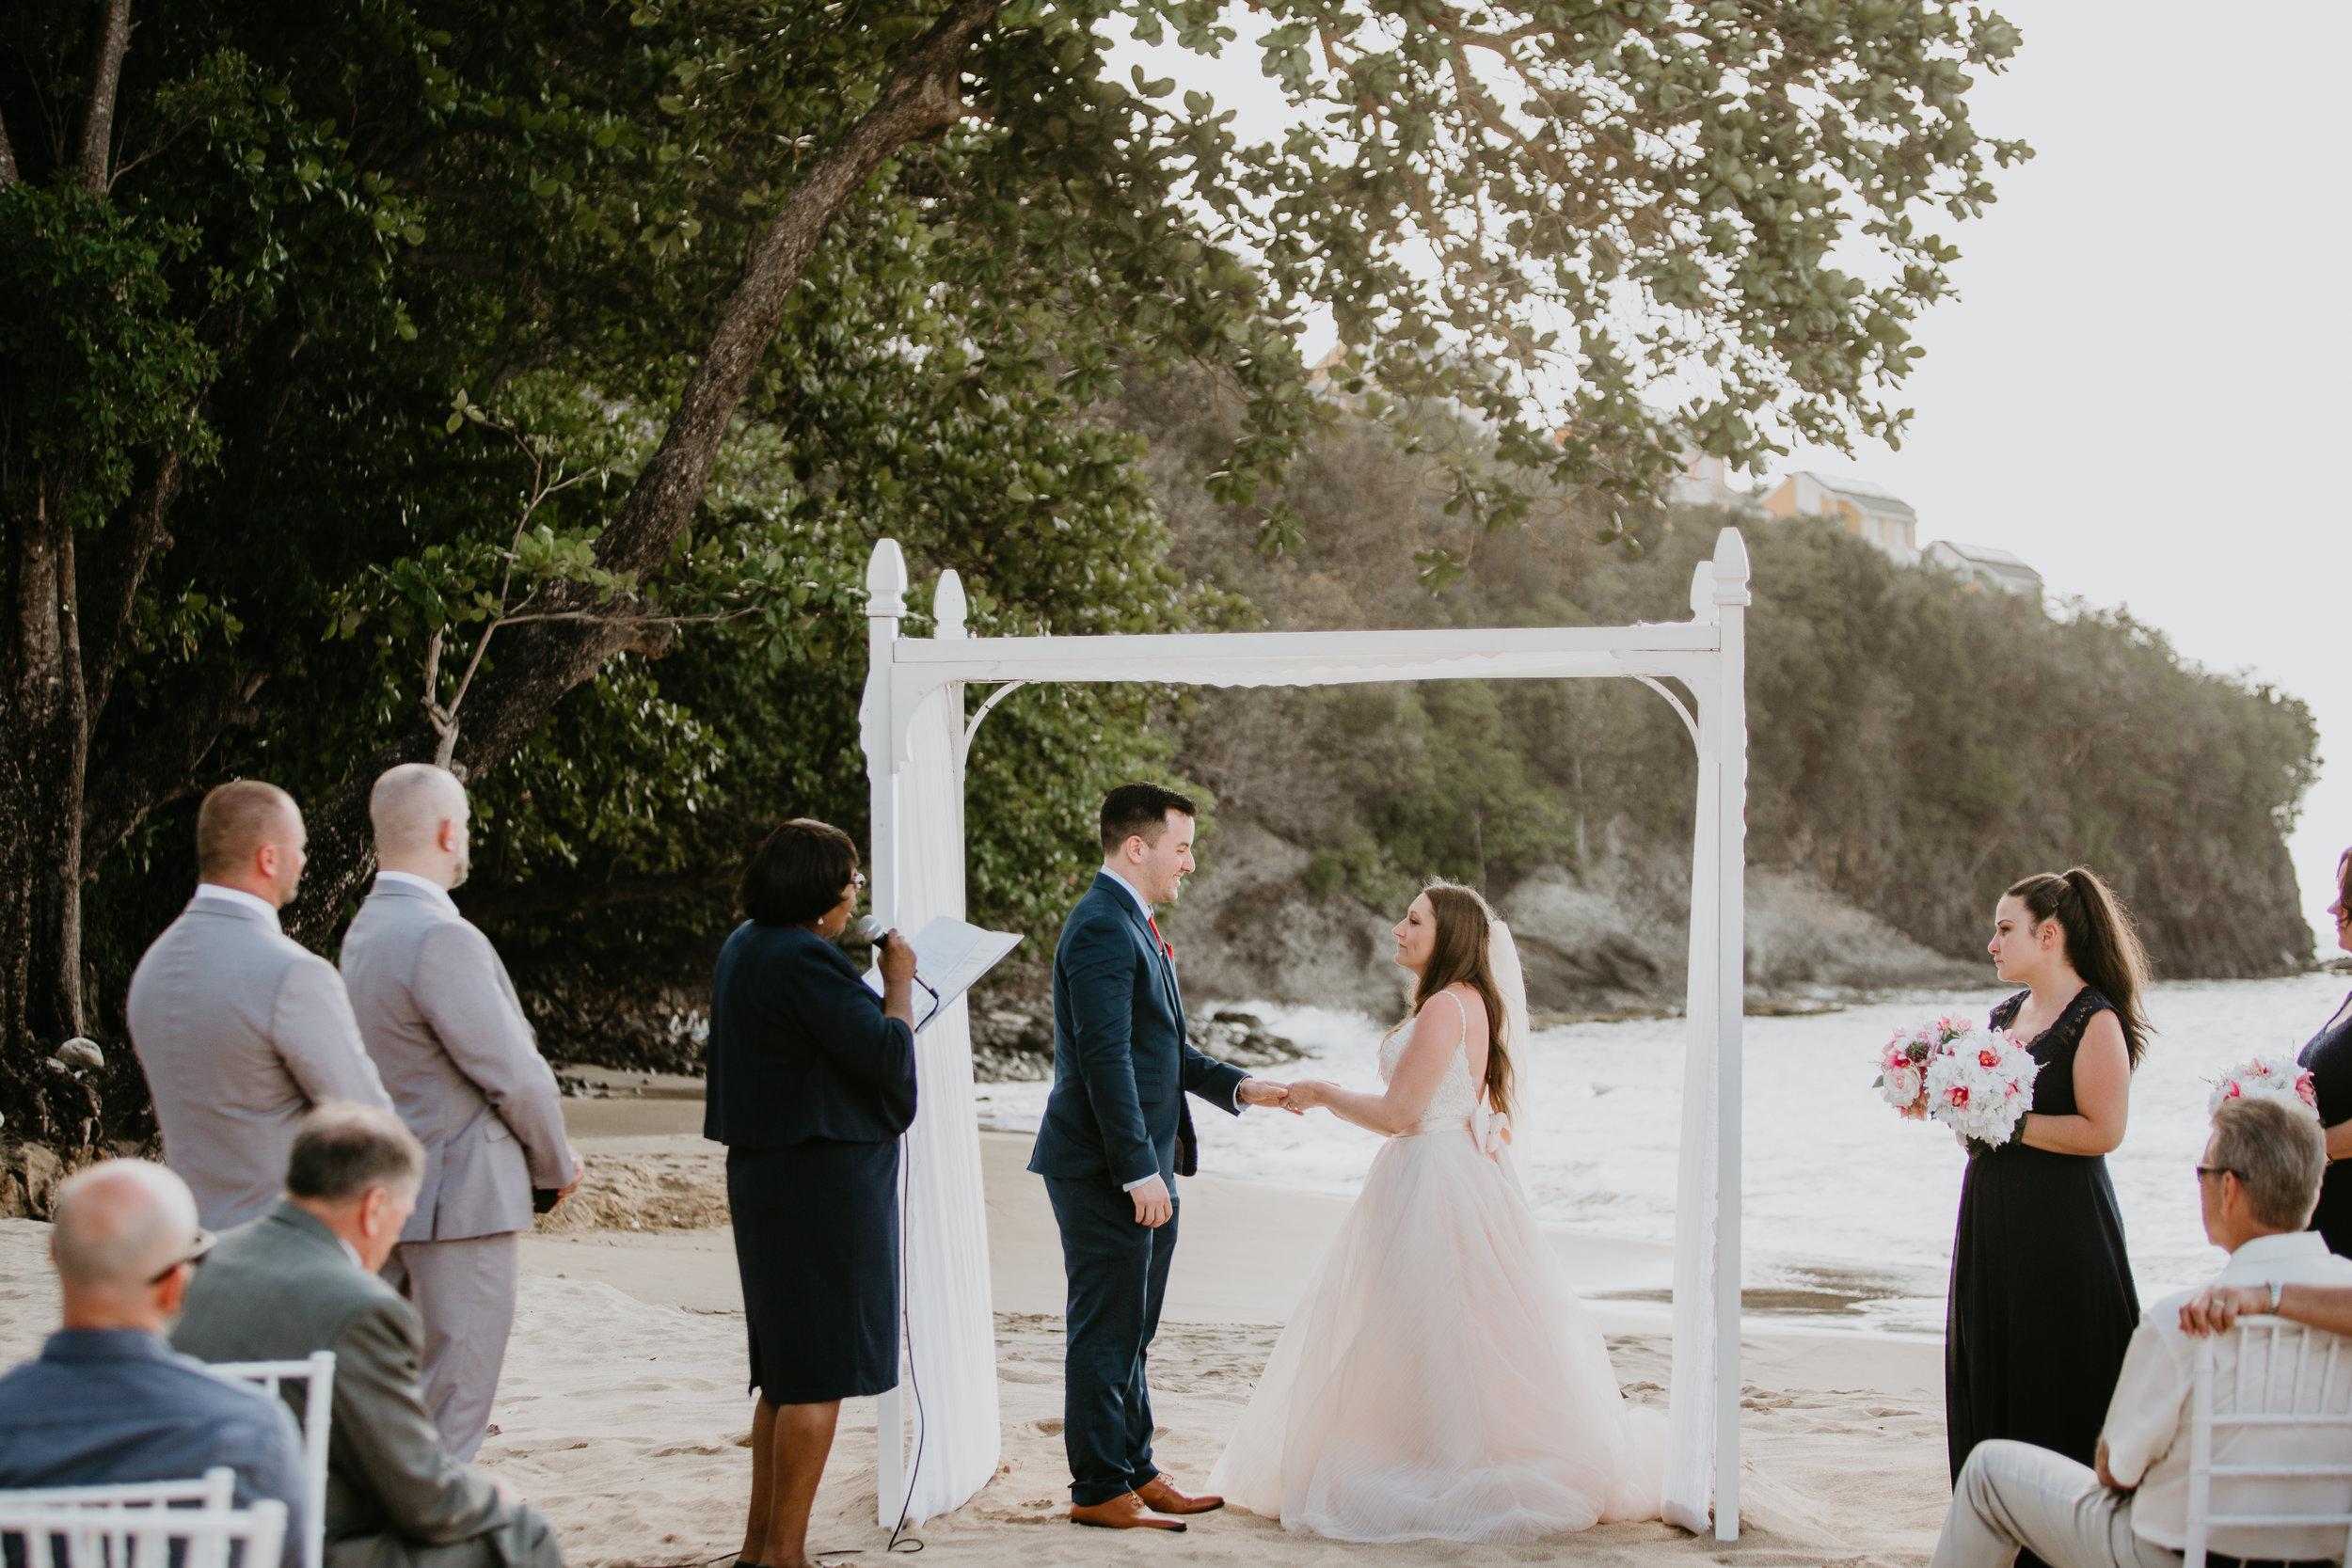 nicole-daacke-photography-destination-wedding-in-st-lucia-sandals-la-toc-intimate-island-wedding-carribean-elopement-photographer-chill-island-wedding-67.jpg